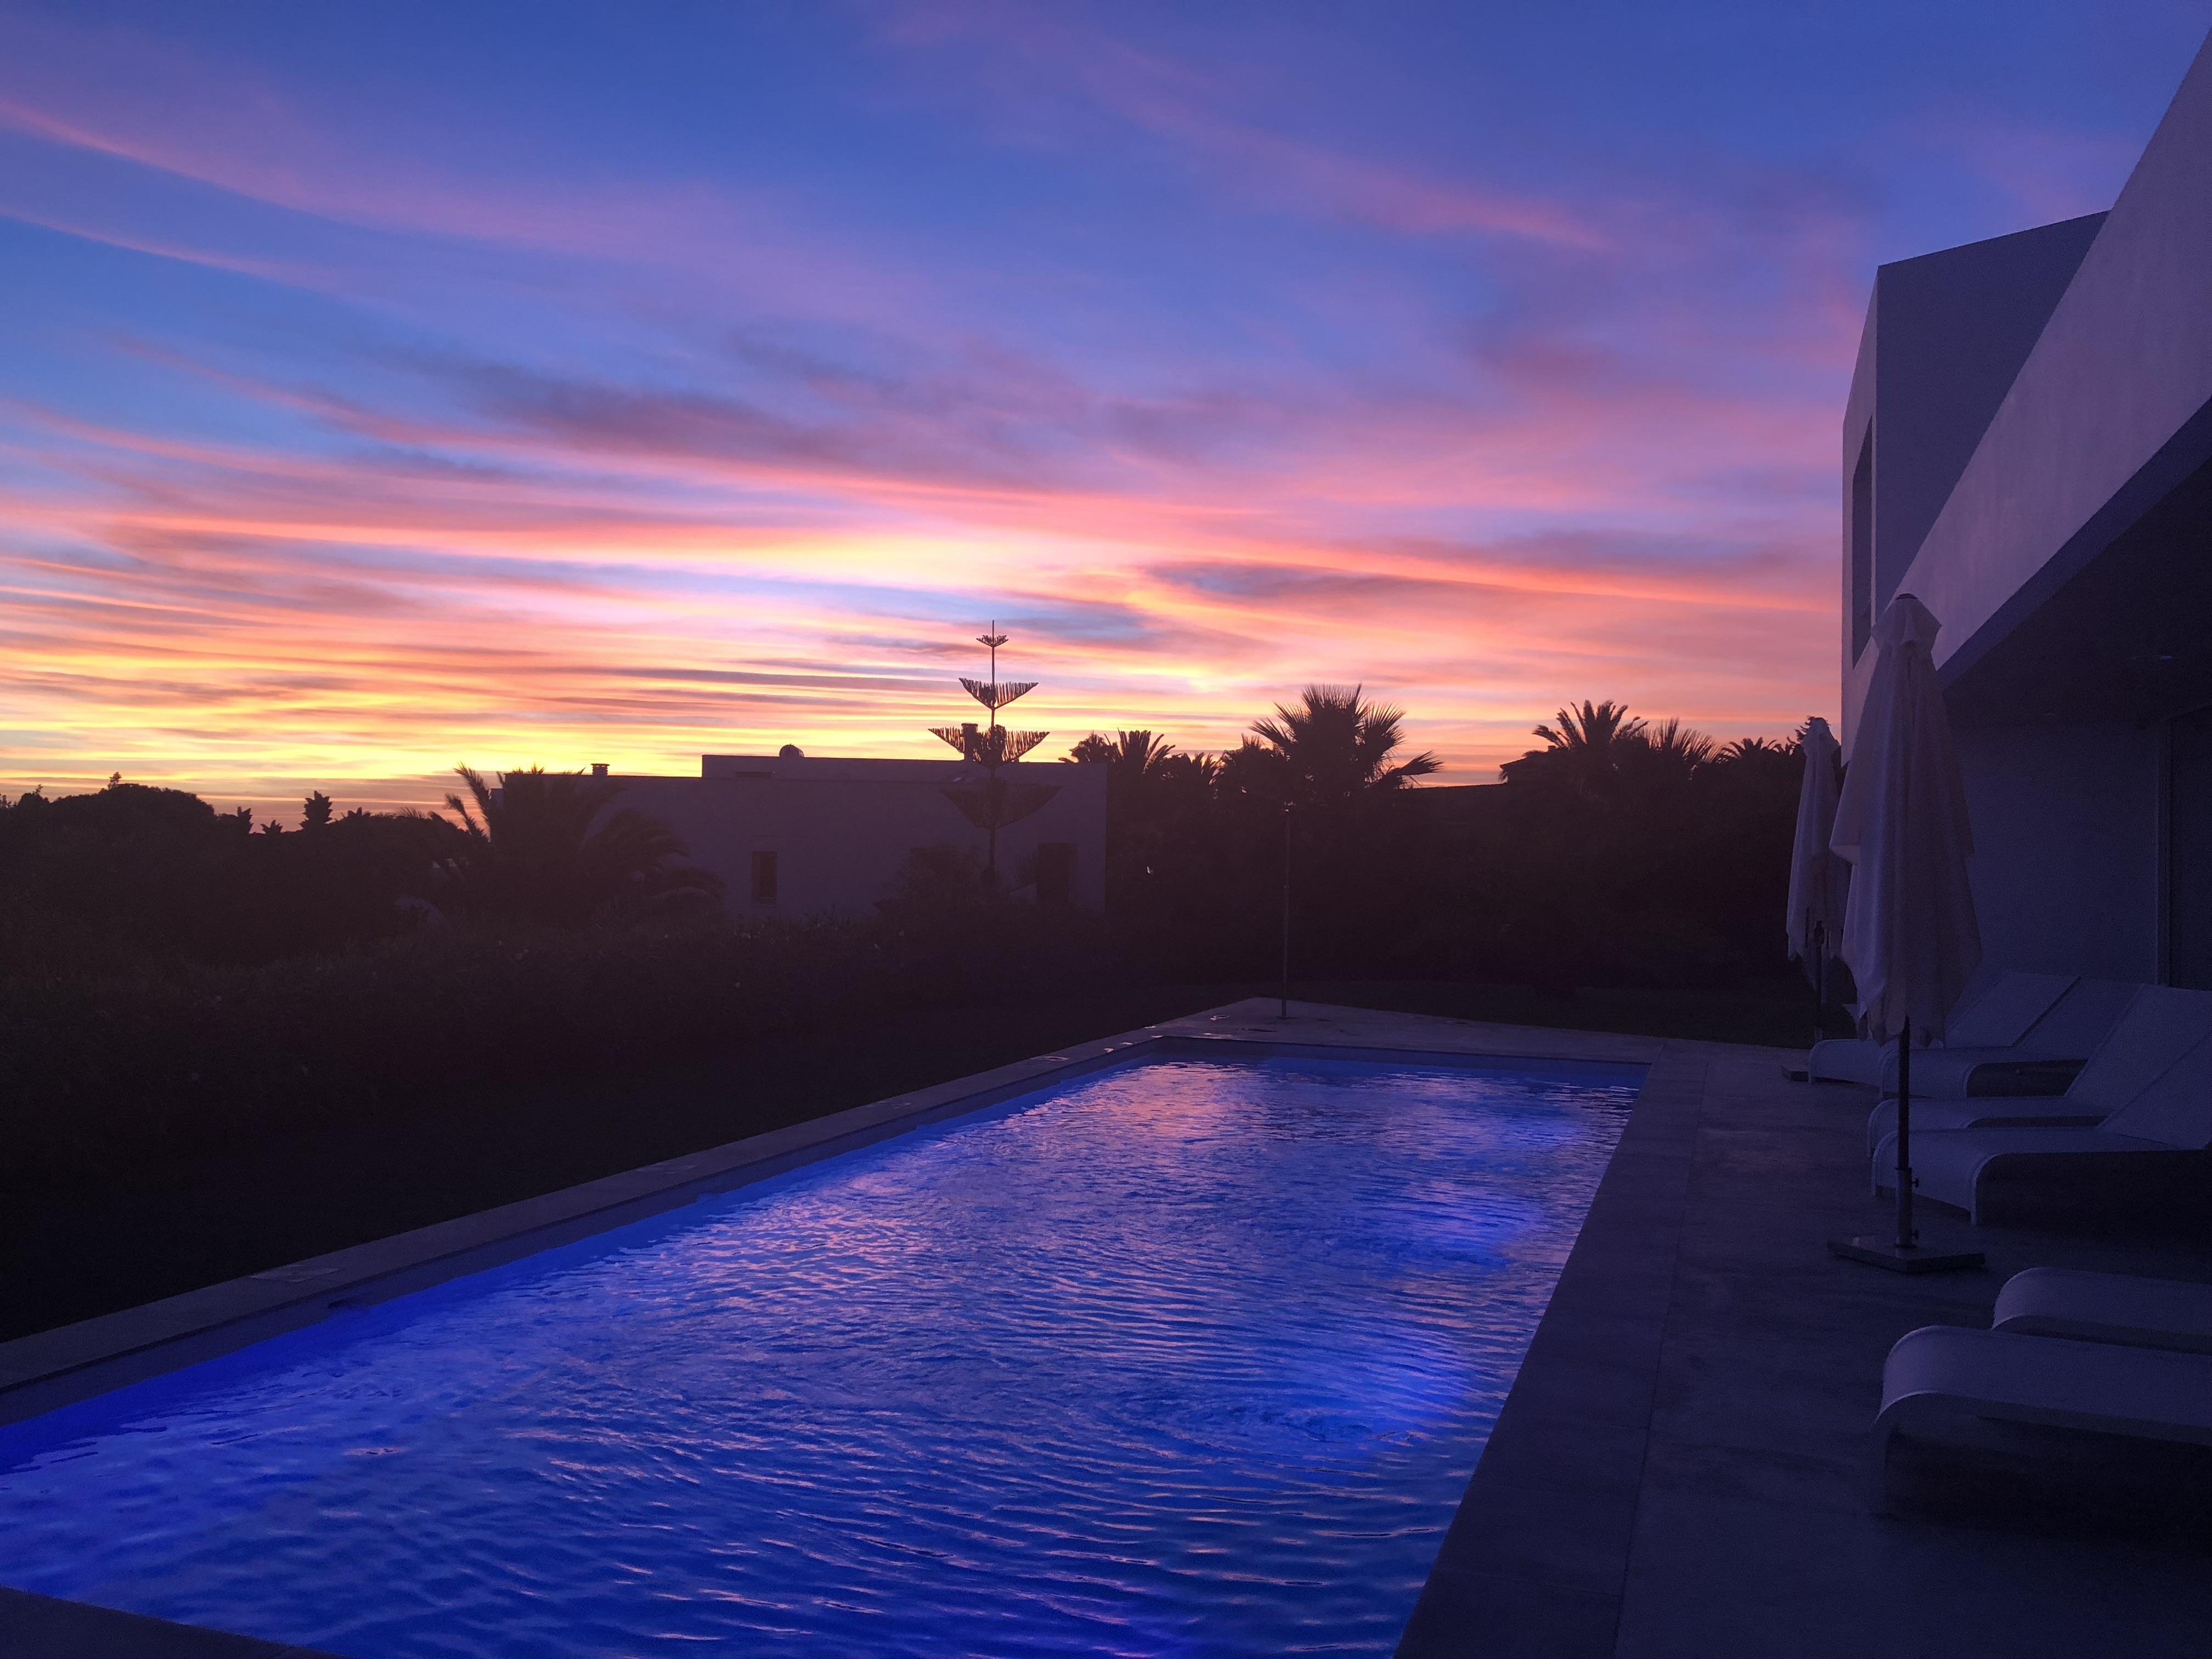 Sonnenuntergang in tausend Farben